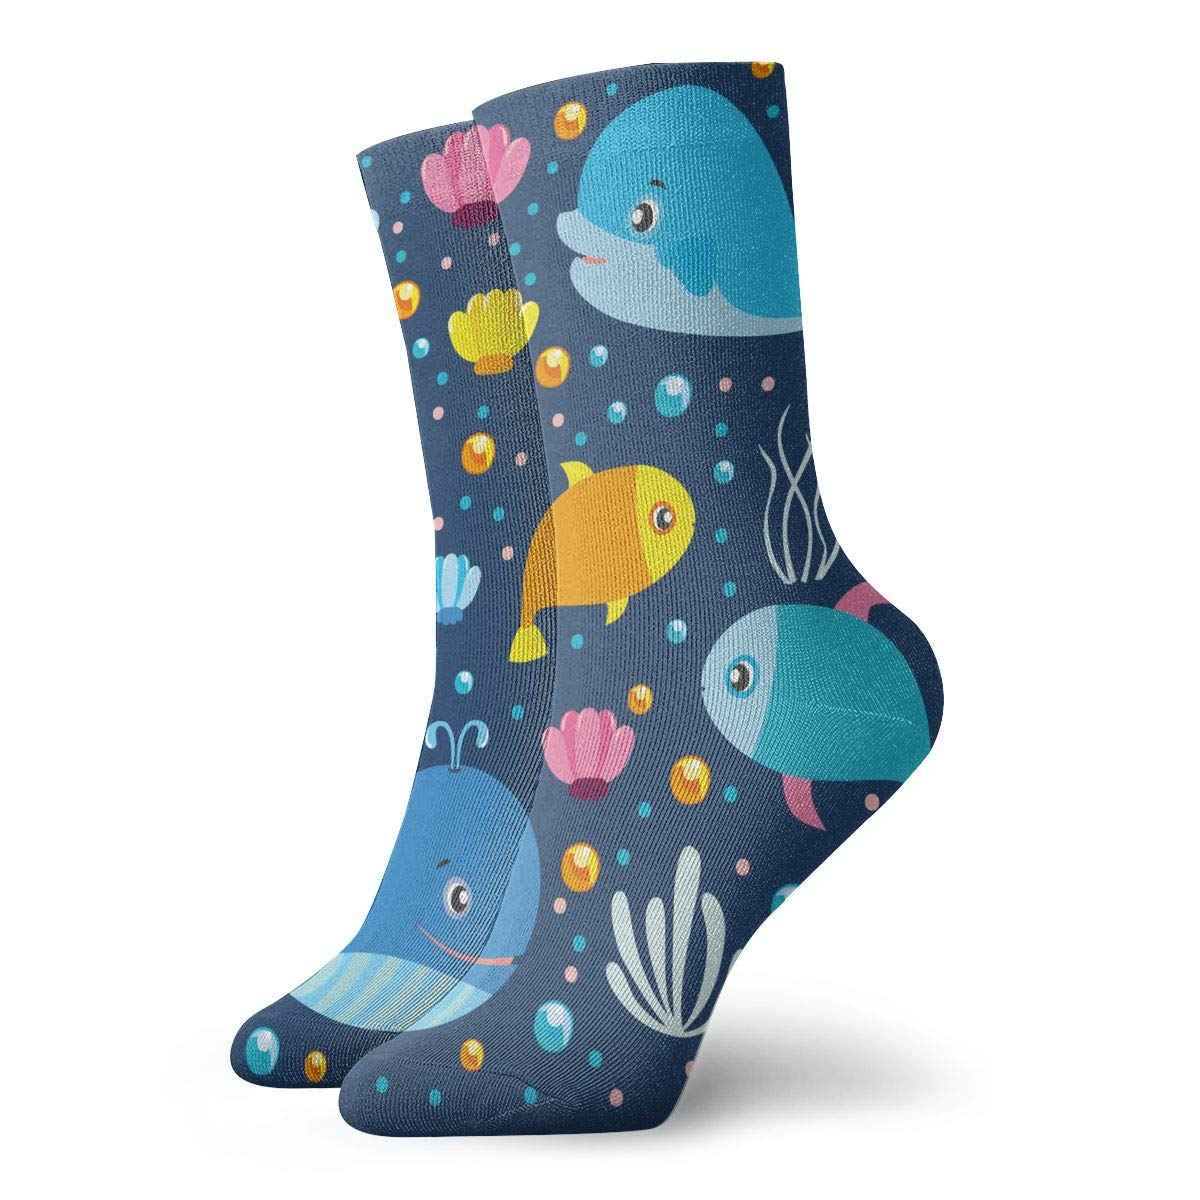 Explore The World Unisex Funny Casual Crew Socks Athletic Socks For Boys Girls Kids Teenagers